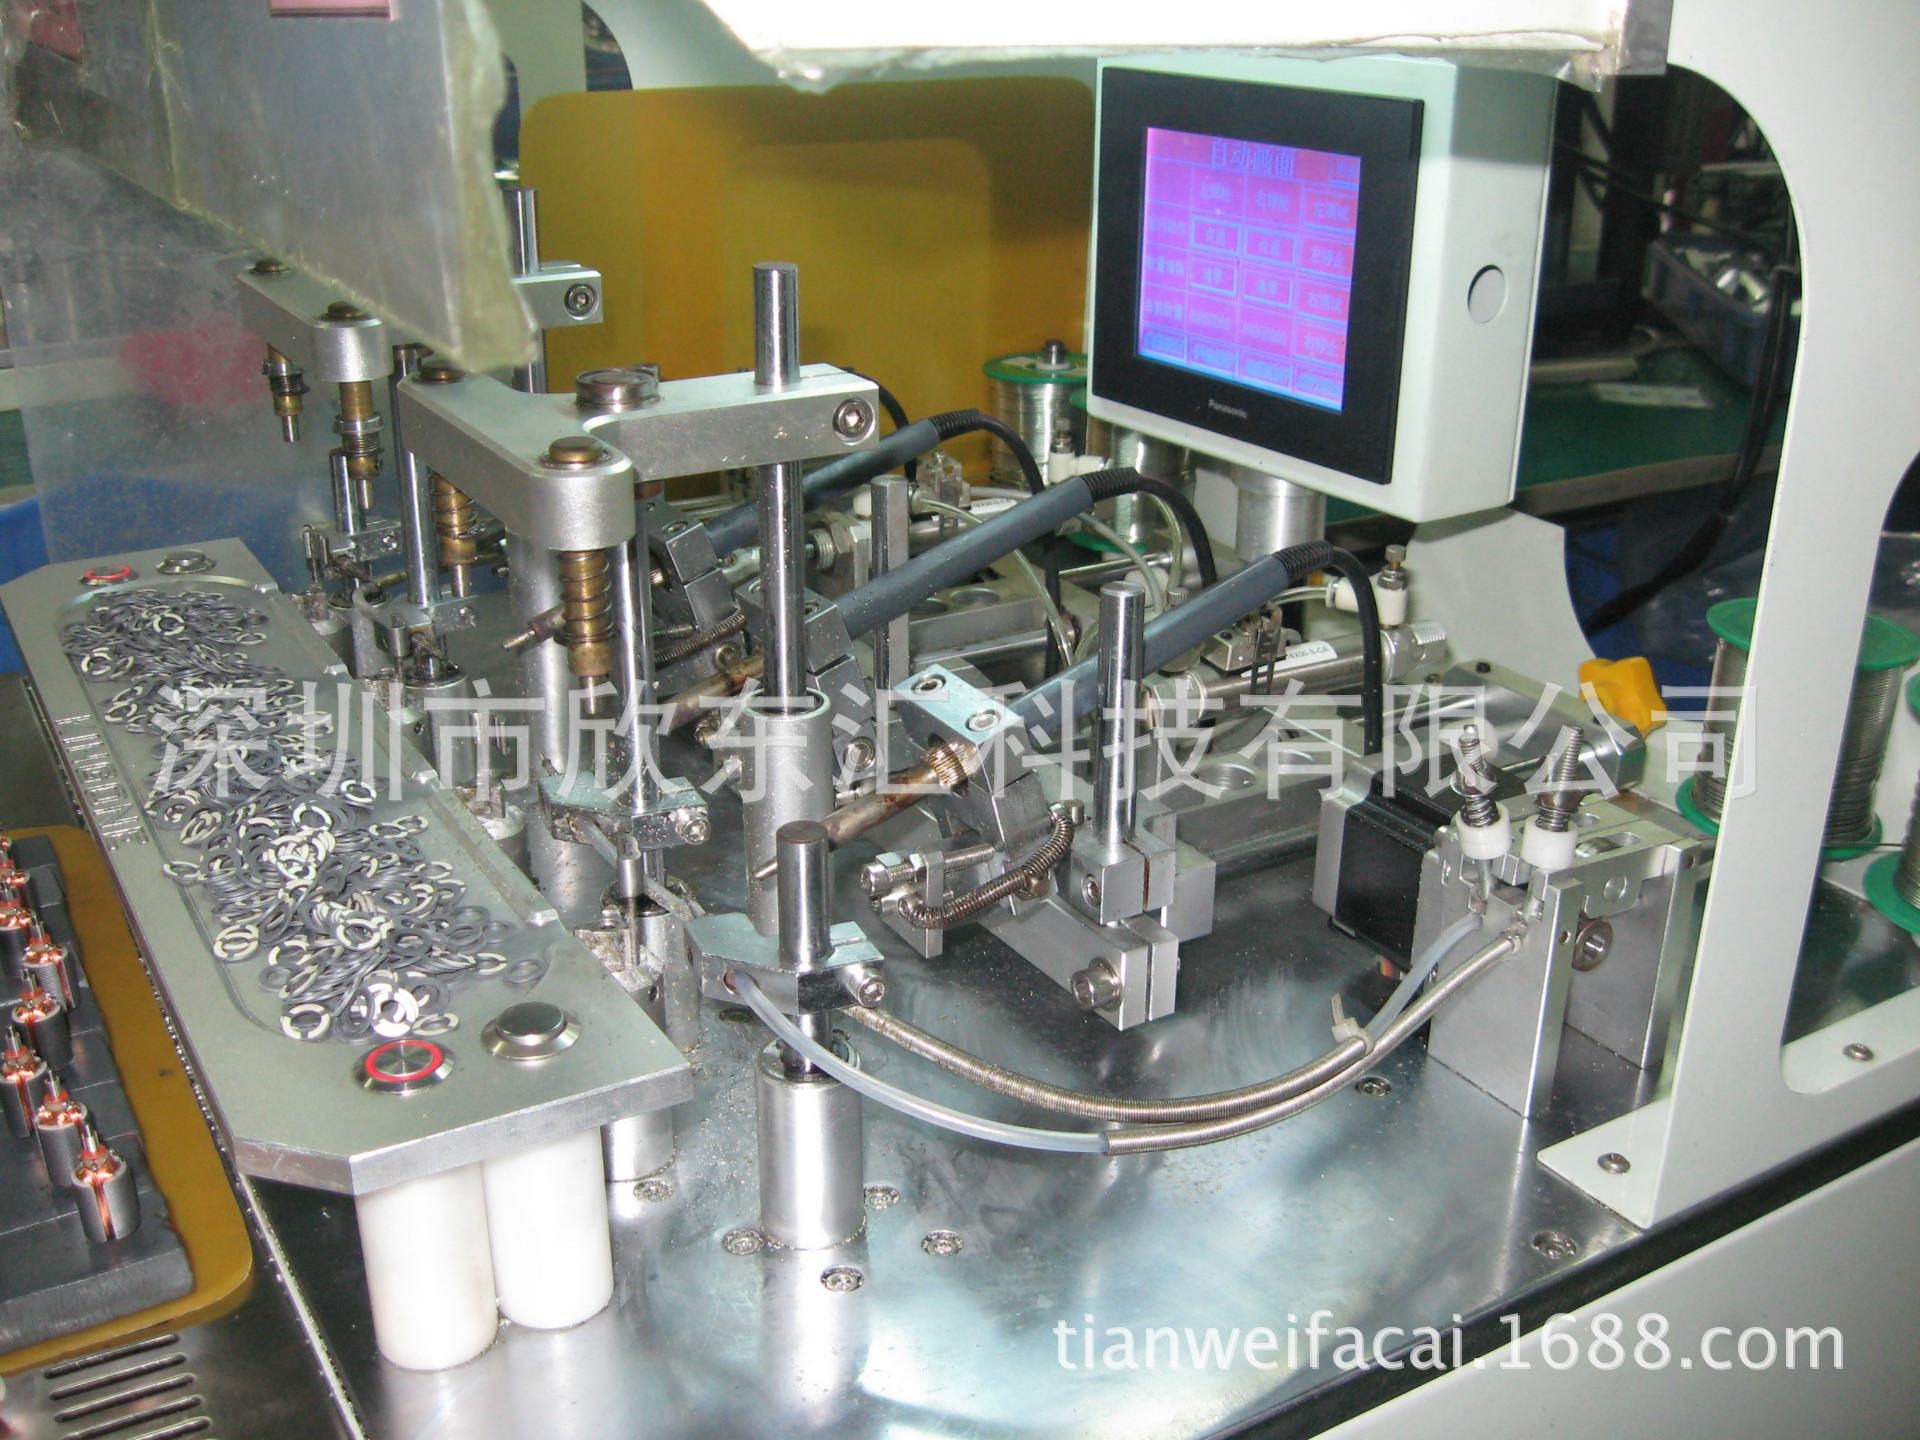 Automatic spot welding machine